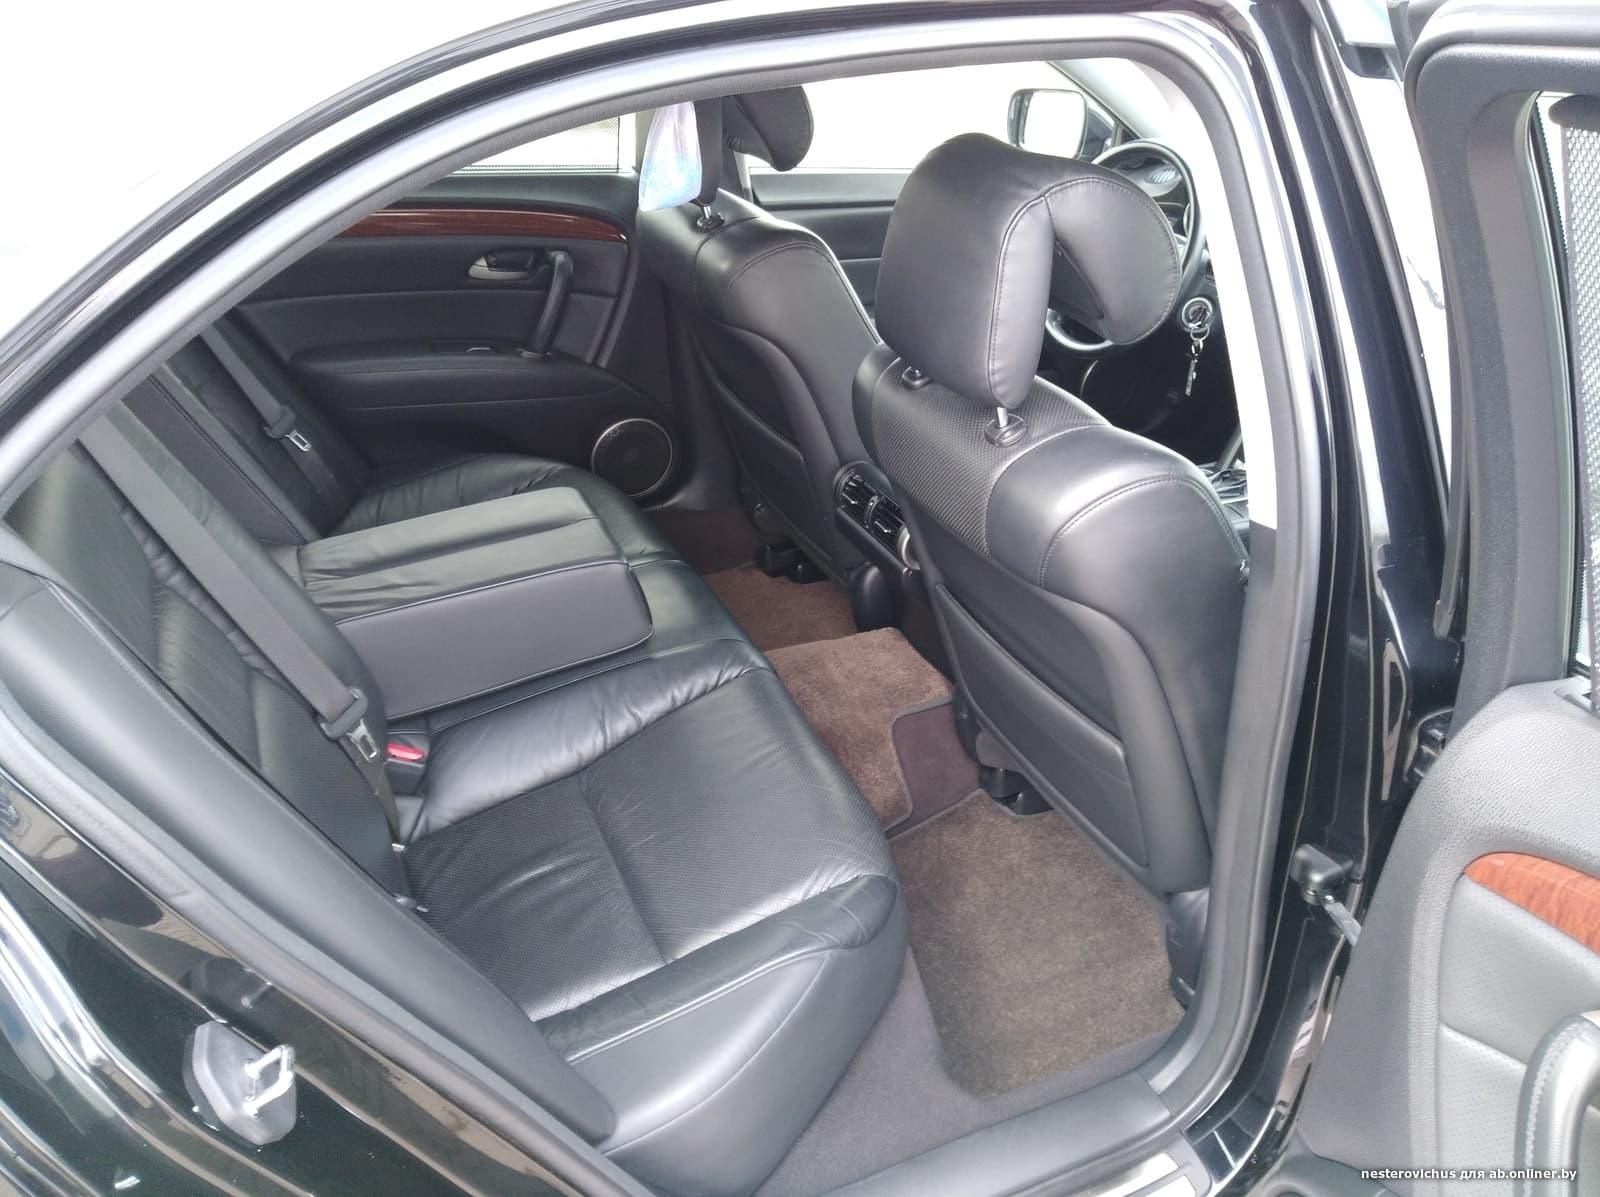 Honda Legend SH-AWD